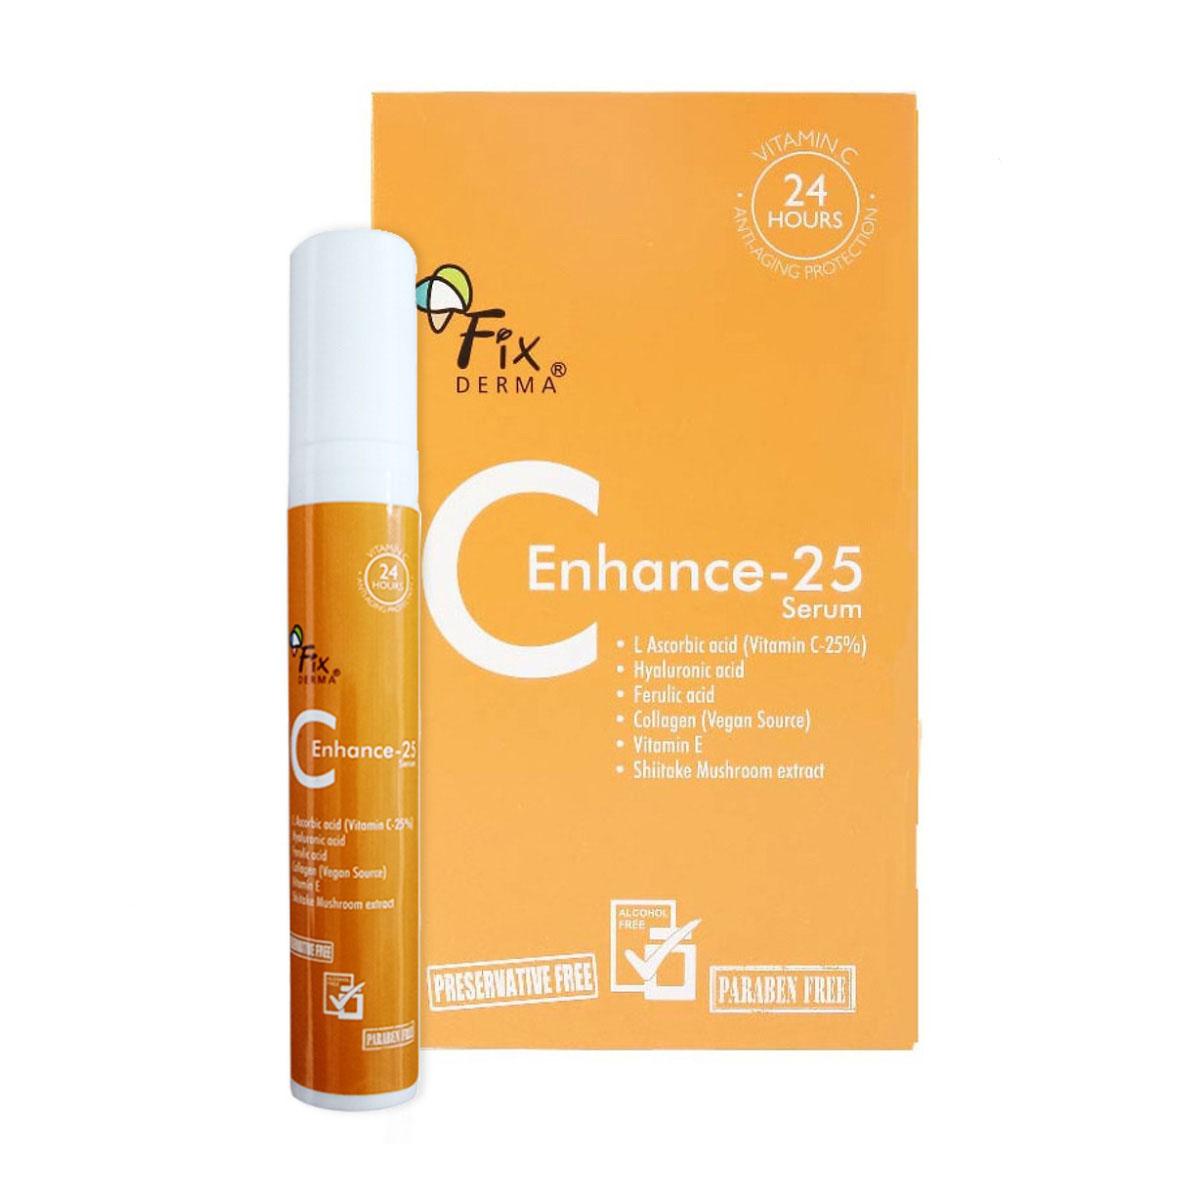 Serum Tái Tạo Da Fixderma C Enhance 25 (15ml)